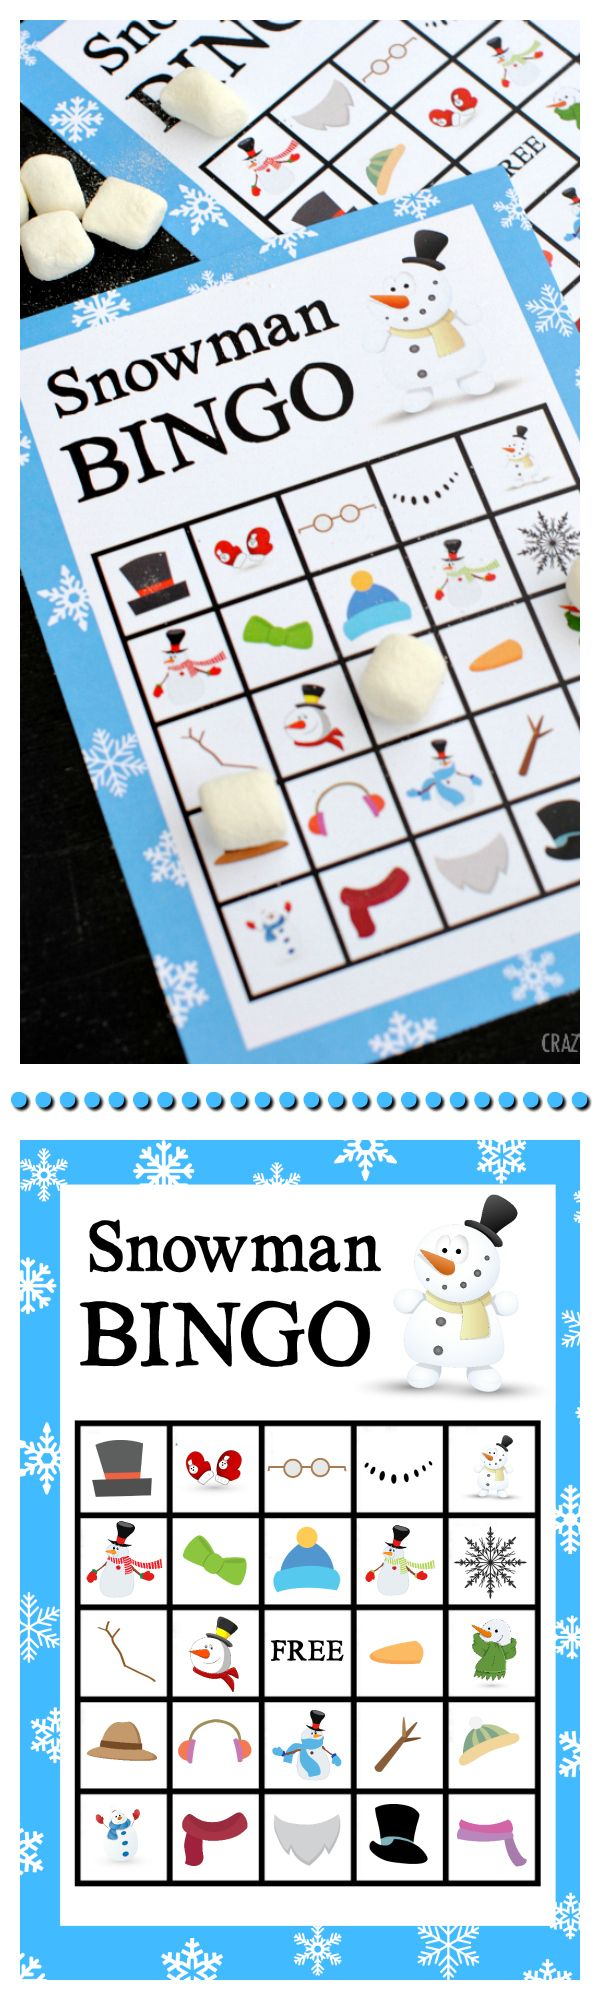 Snowman Bingo Game